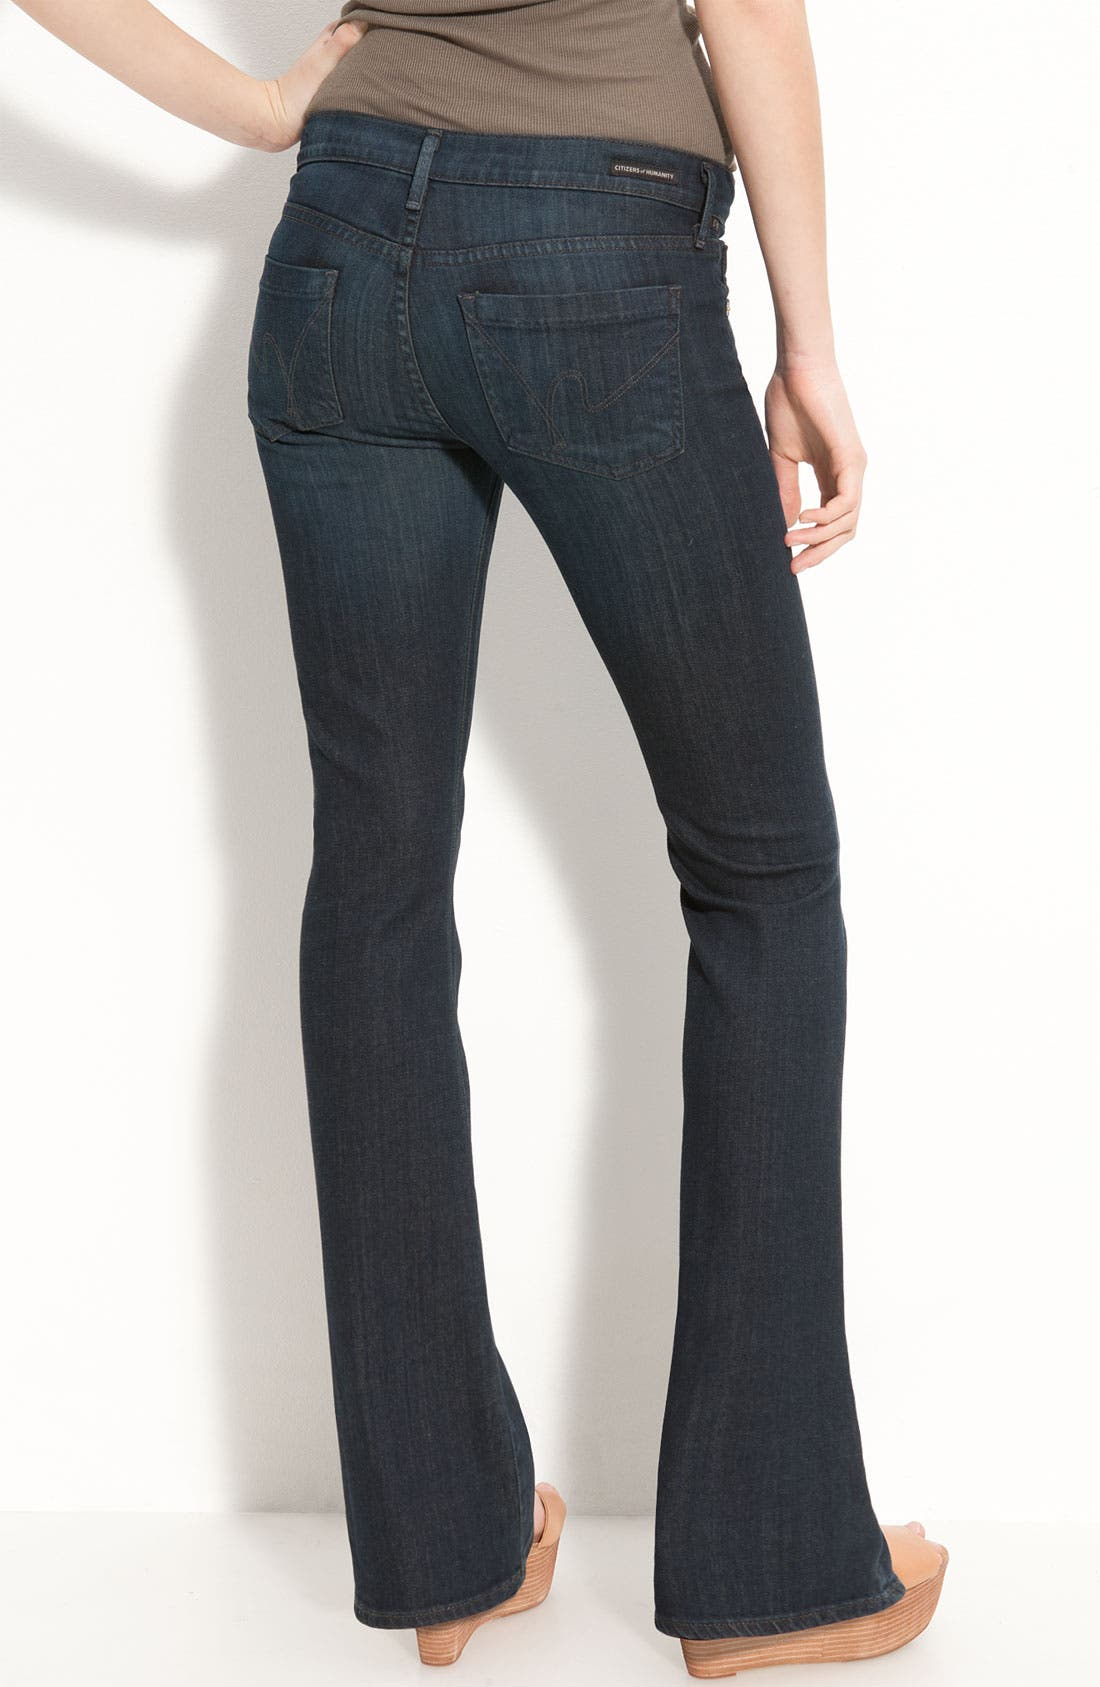 Main Image - Citizens of Humanity 'Dita' Bootcut Jeans (Jupiter Wash) (Petite)